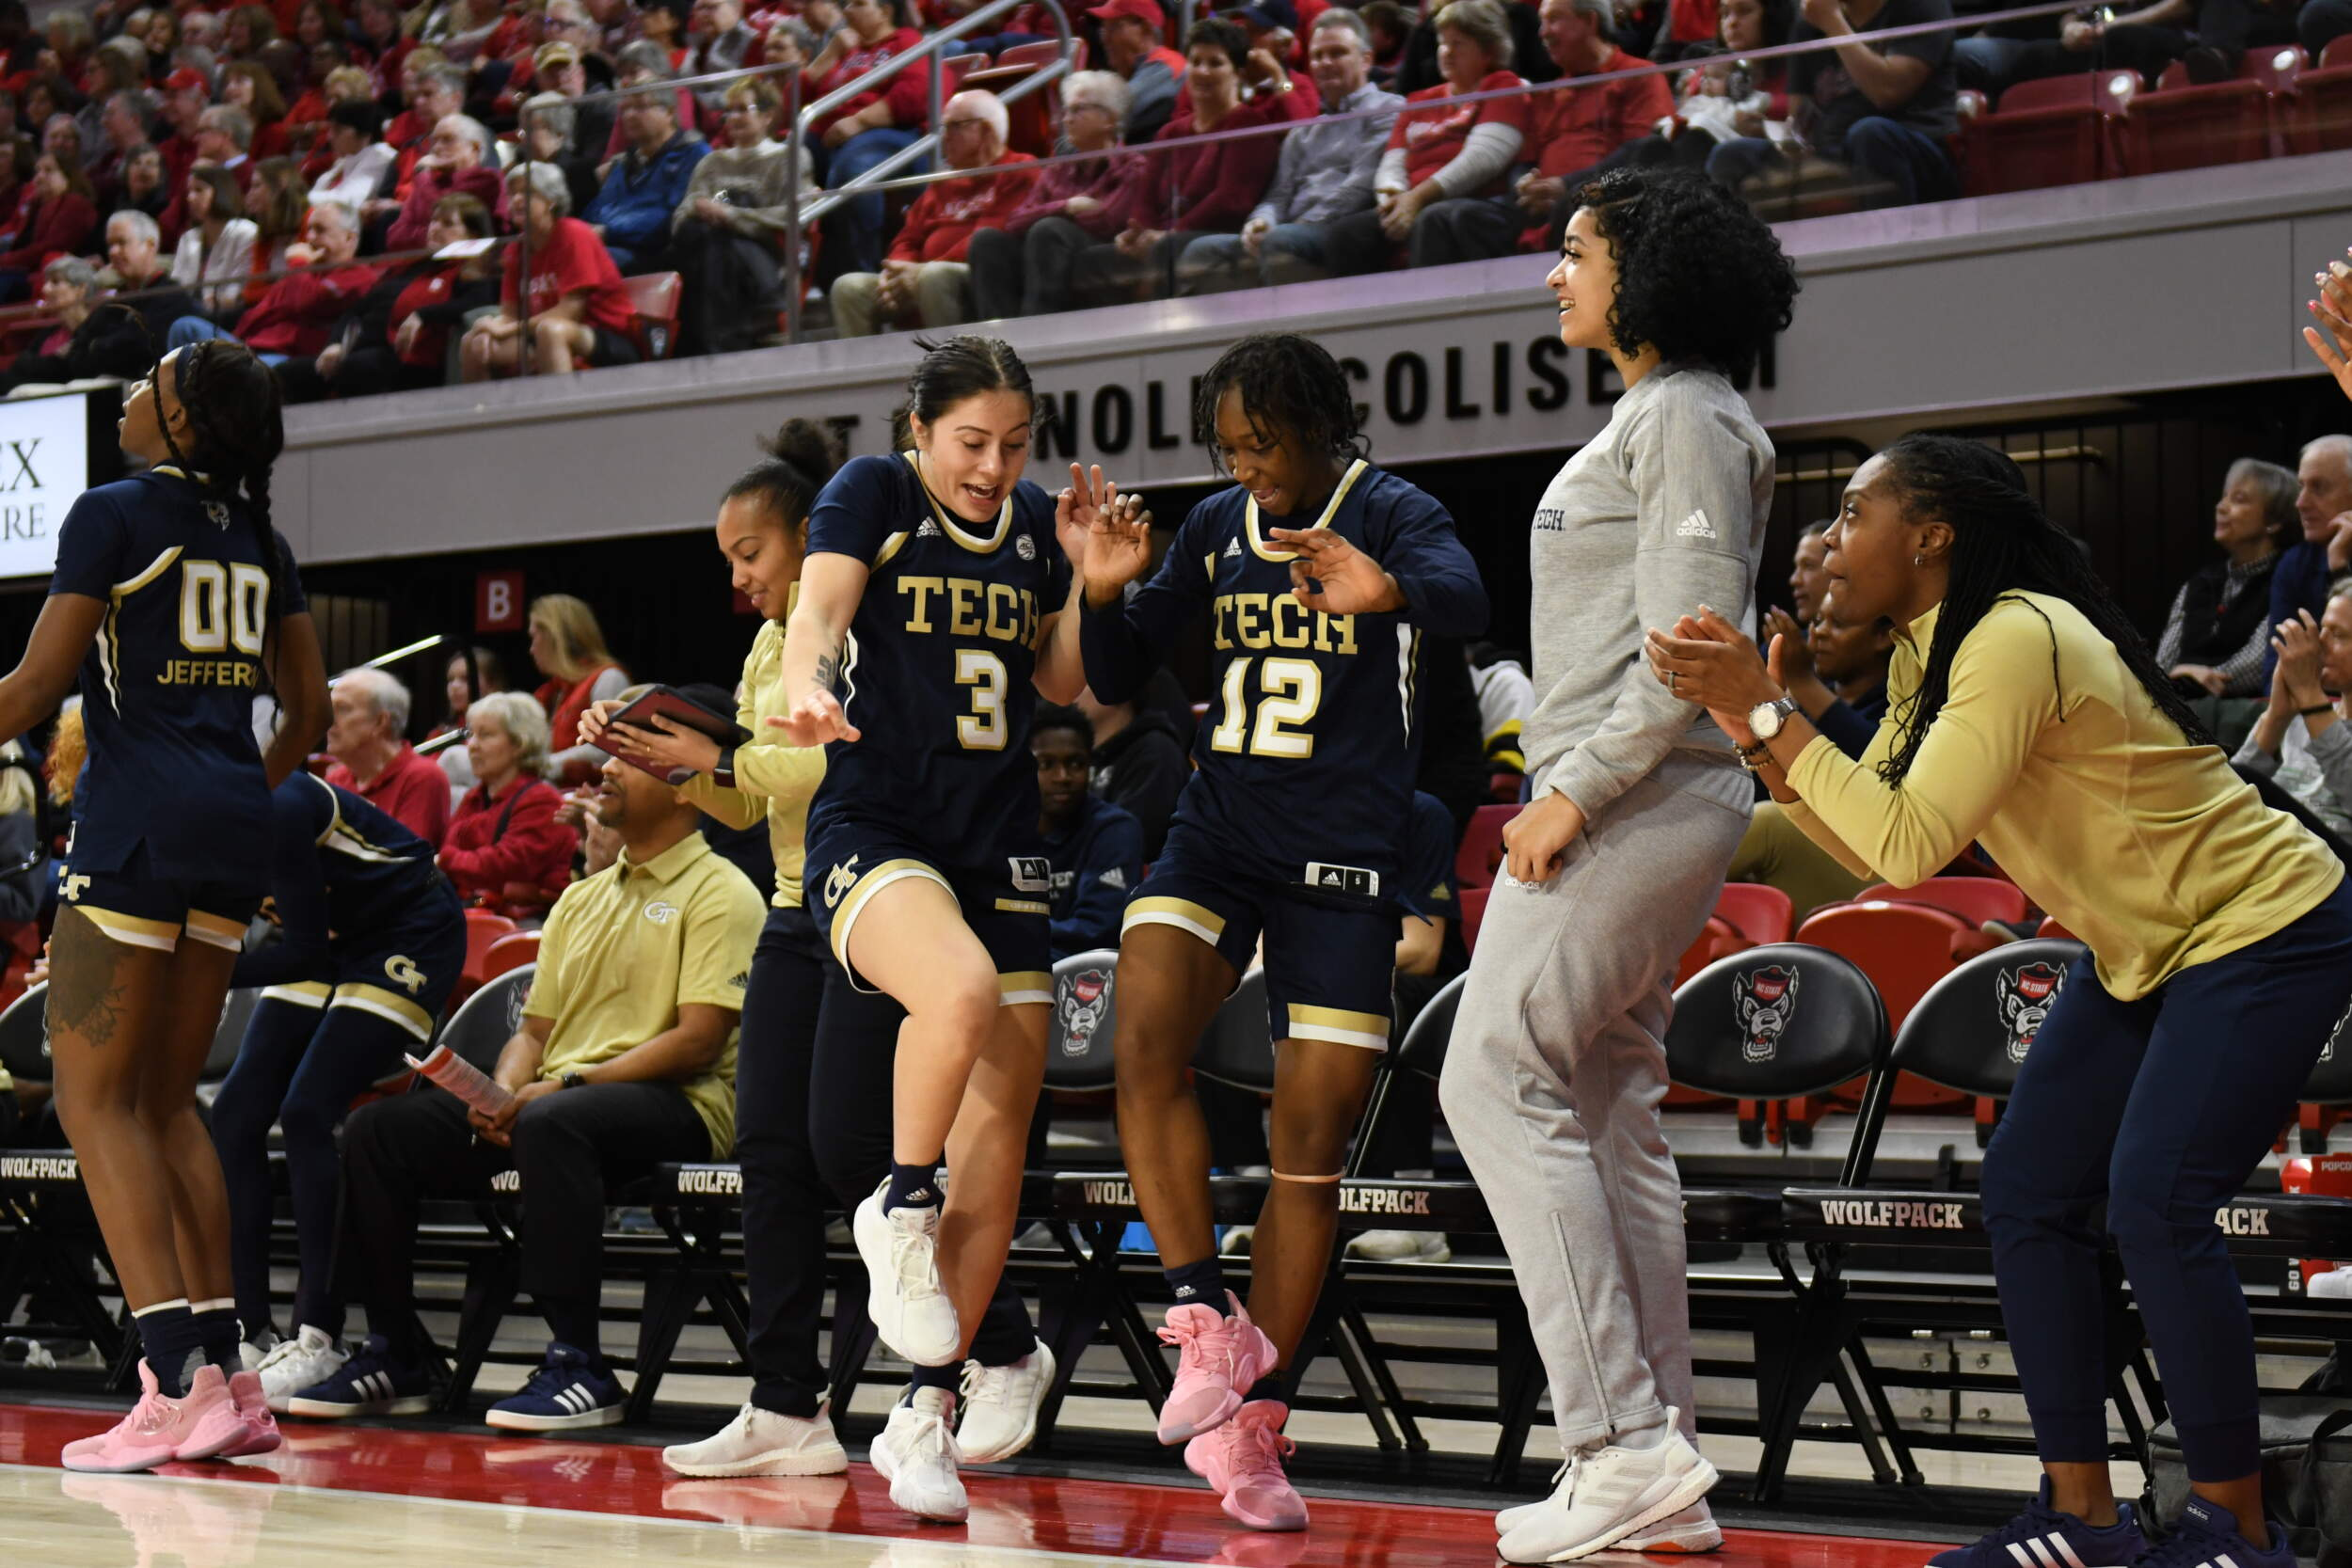 VIDEO: Women's Basketball Shocks No. 4 NC State